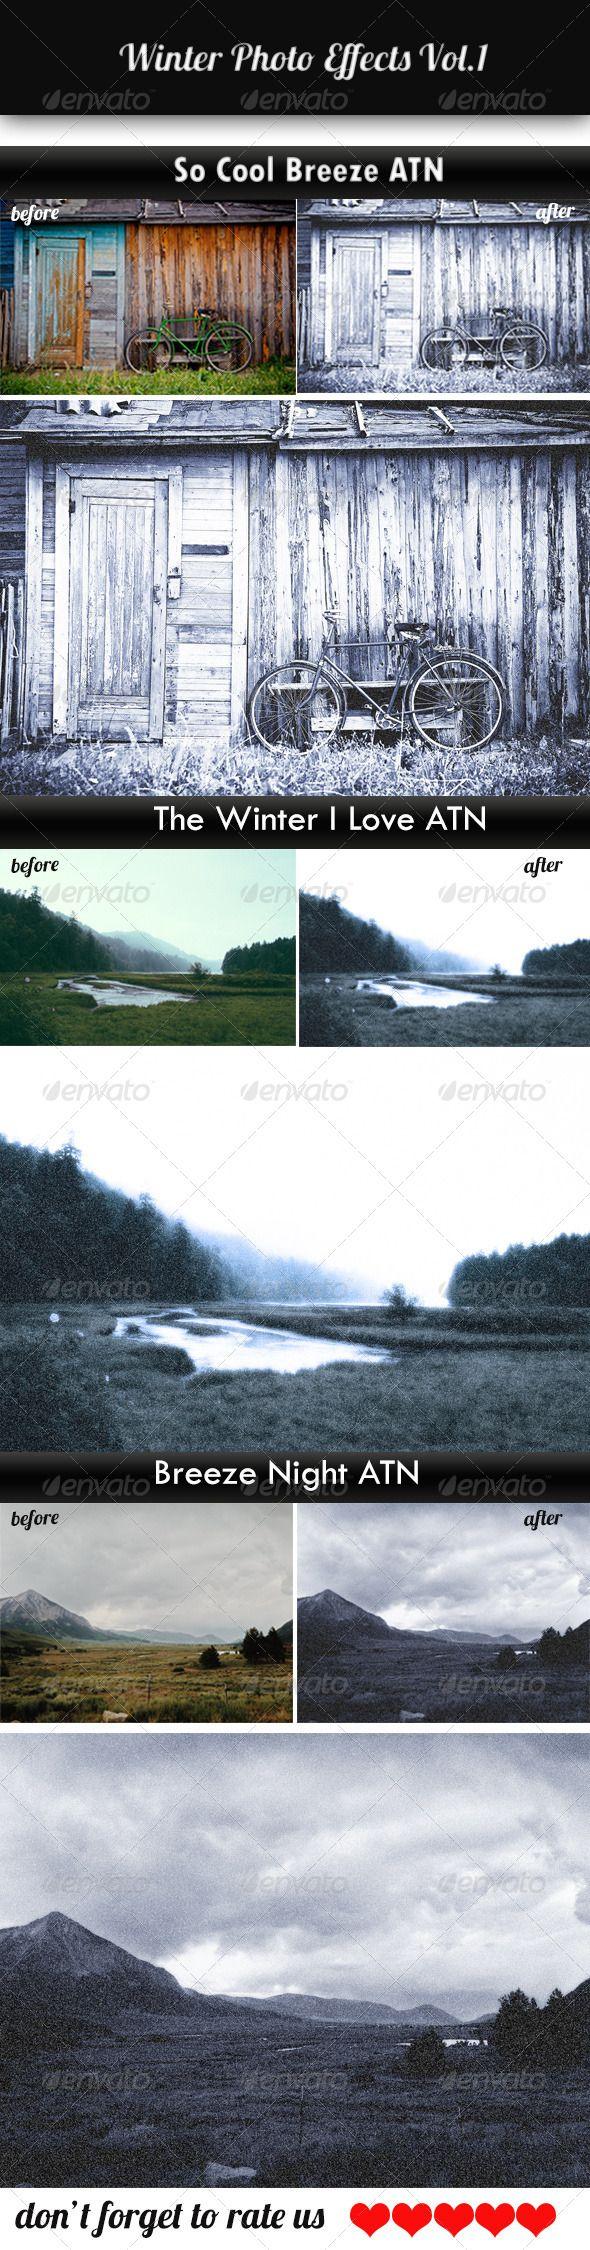 Winter Photo Effects Vol.1